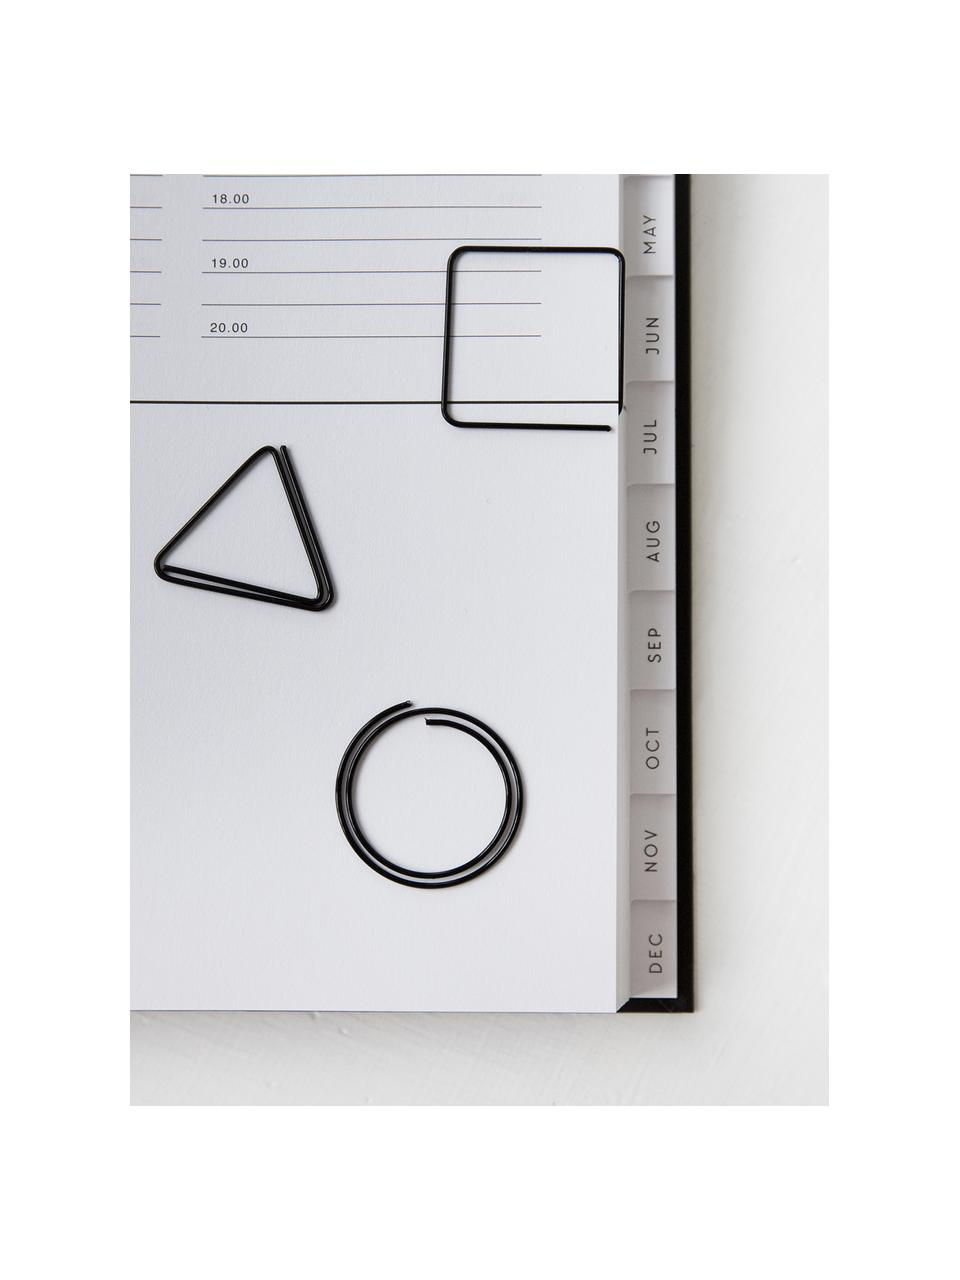 Set di graffette Geometria 9 pz, Metallo verniciato, Nero, Larg. 3 x Alt. 3 cm